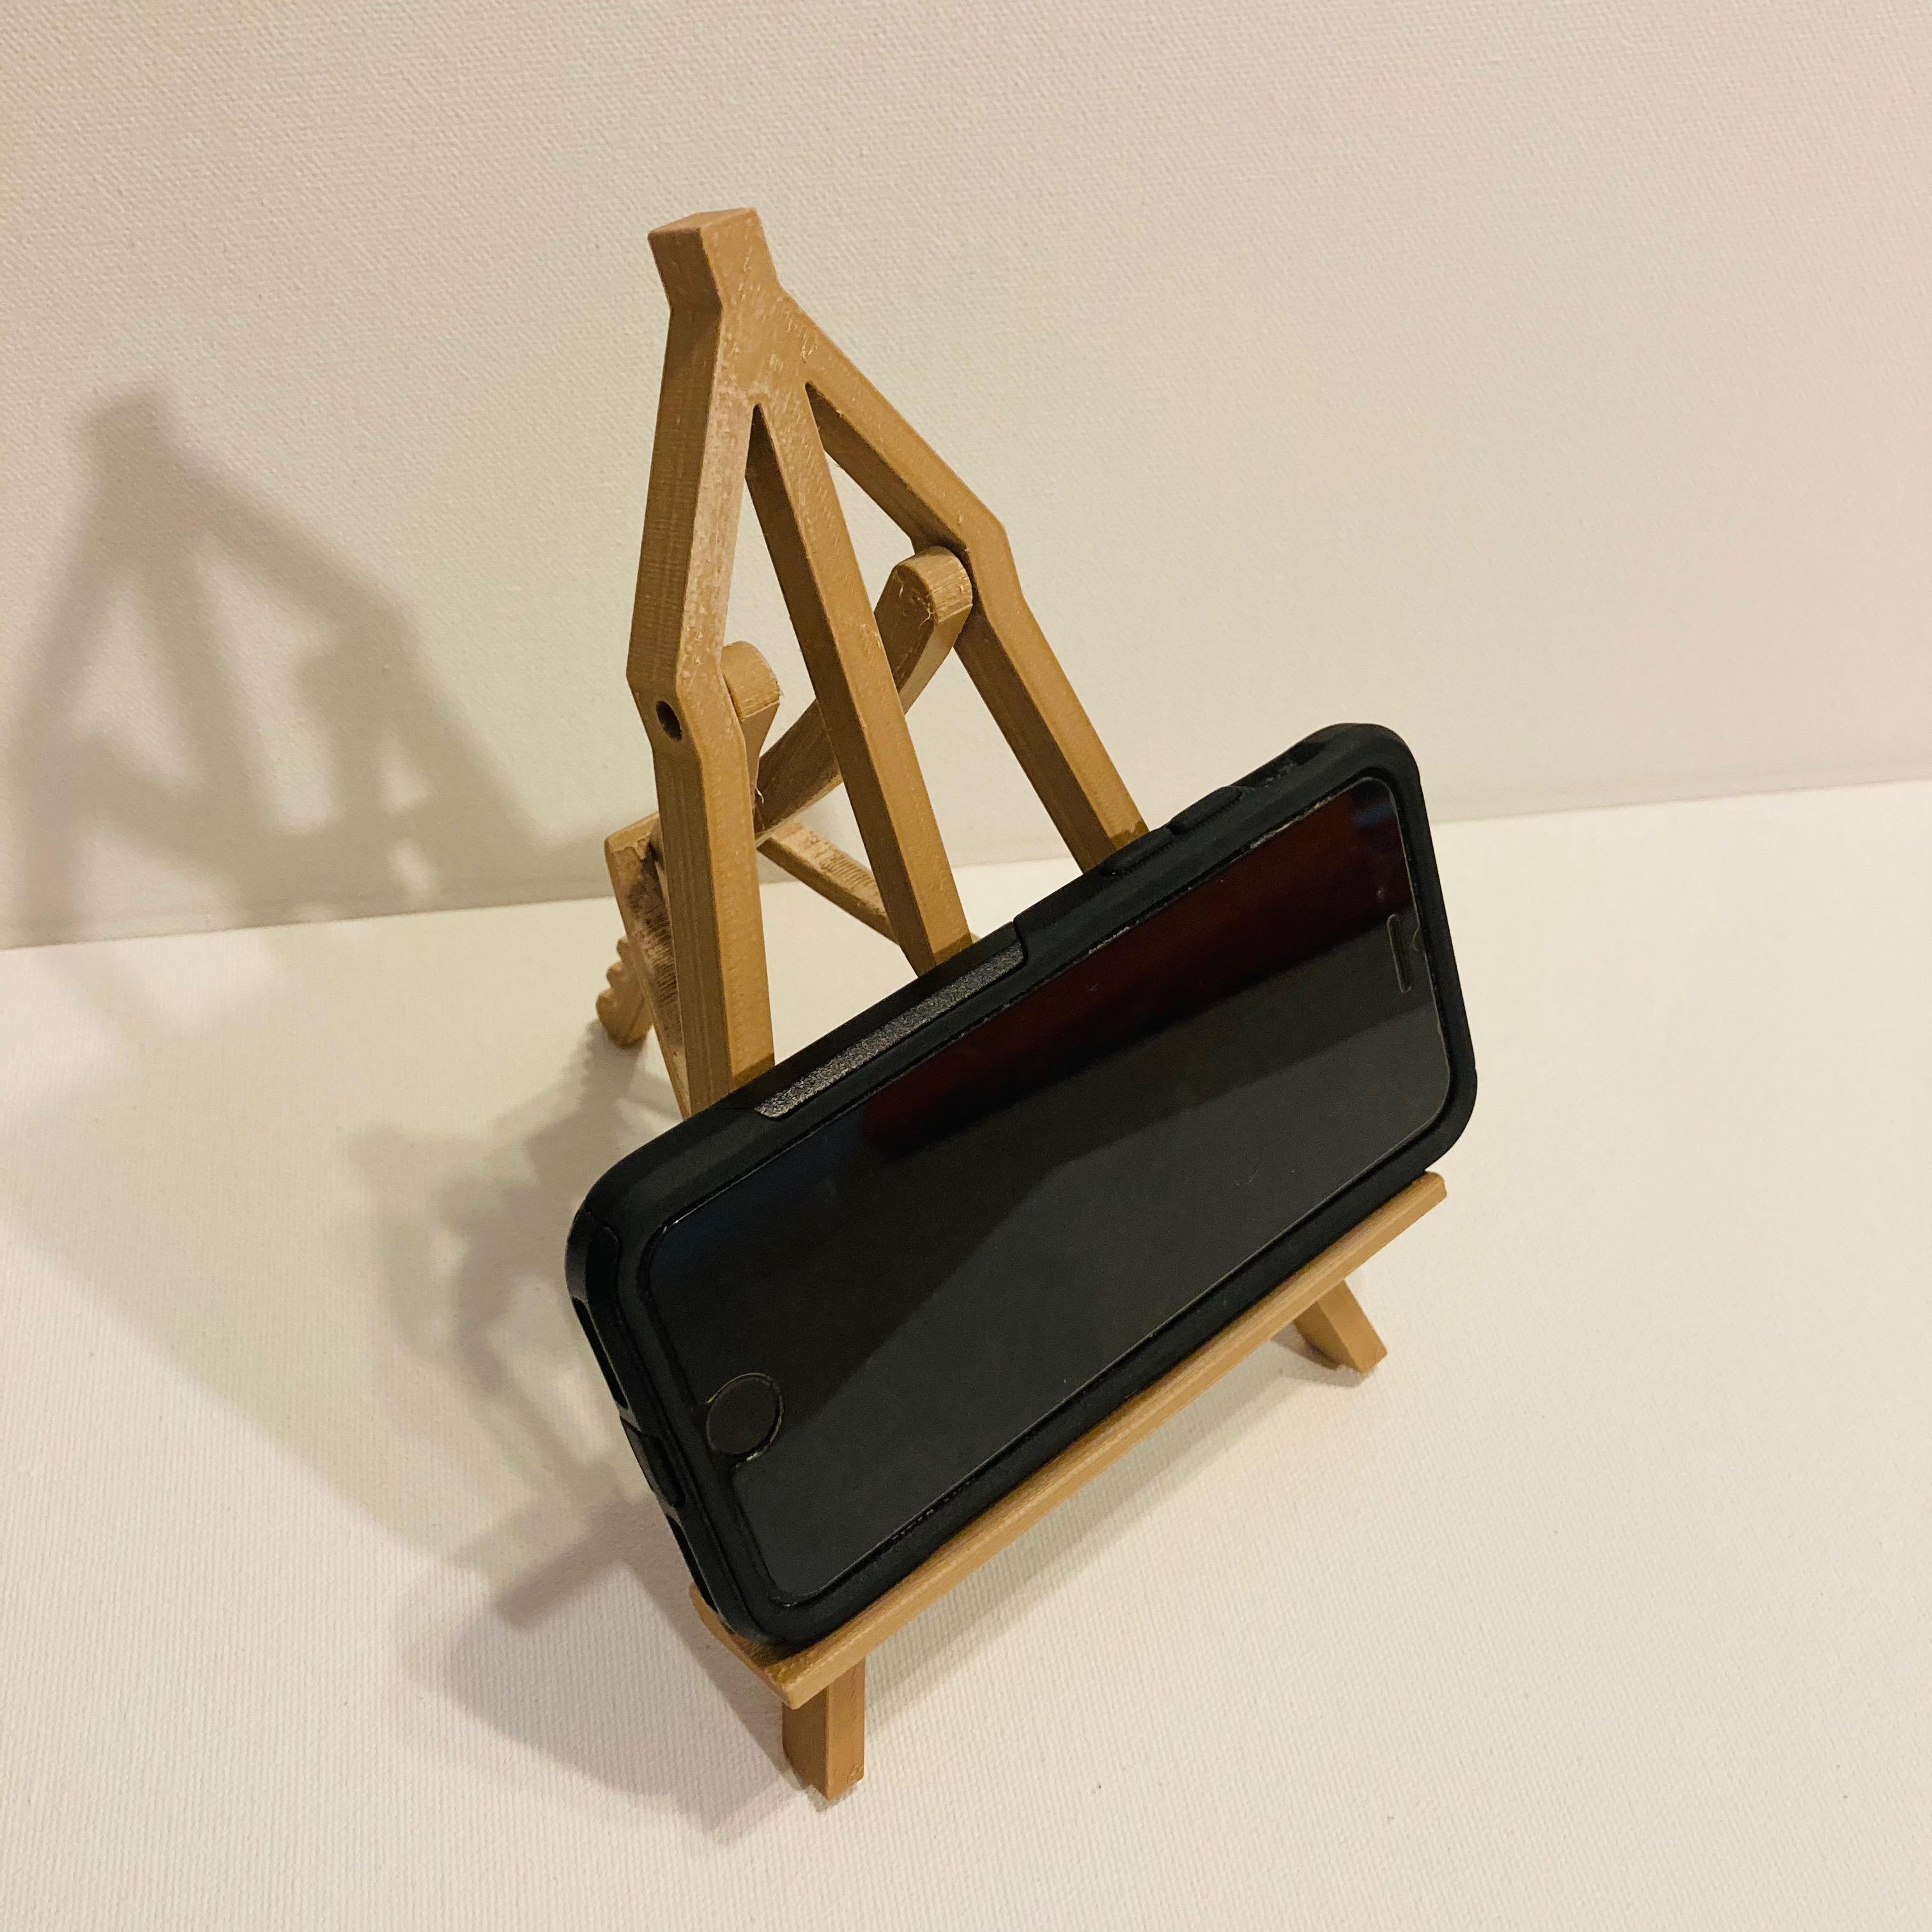 3D Printed Phone Easel